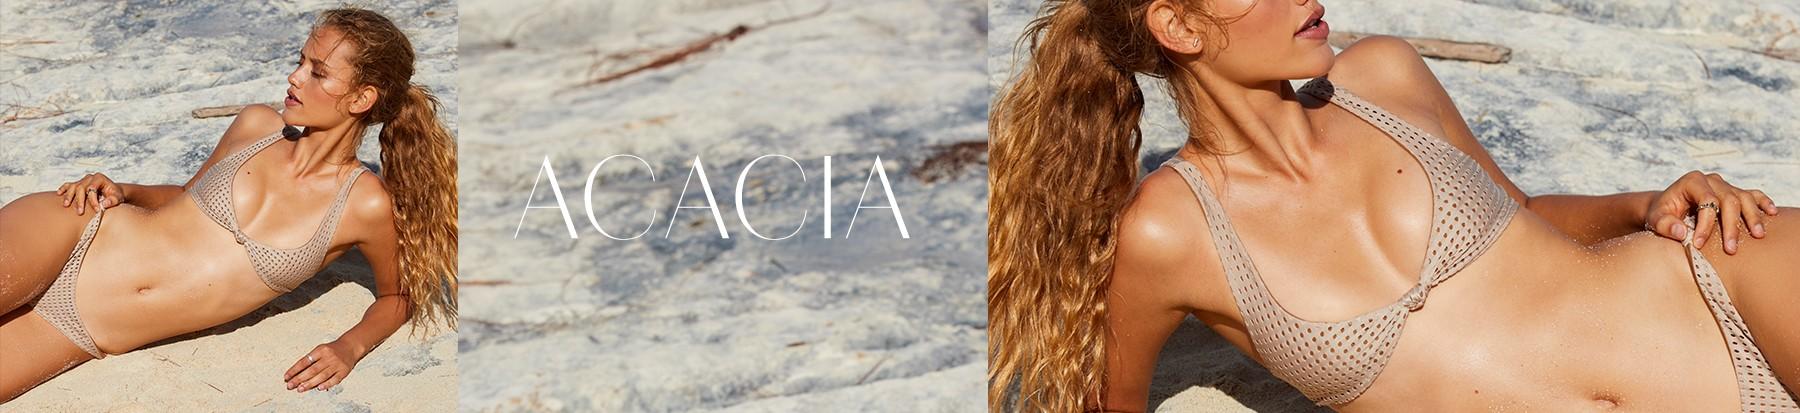 Acacia Bikinis